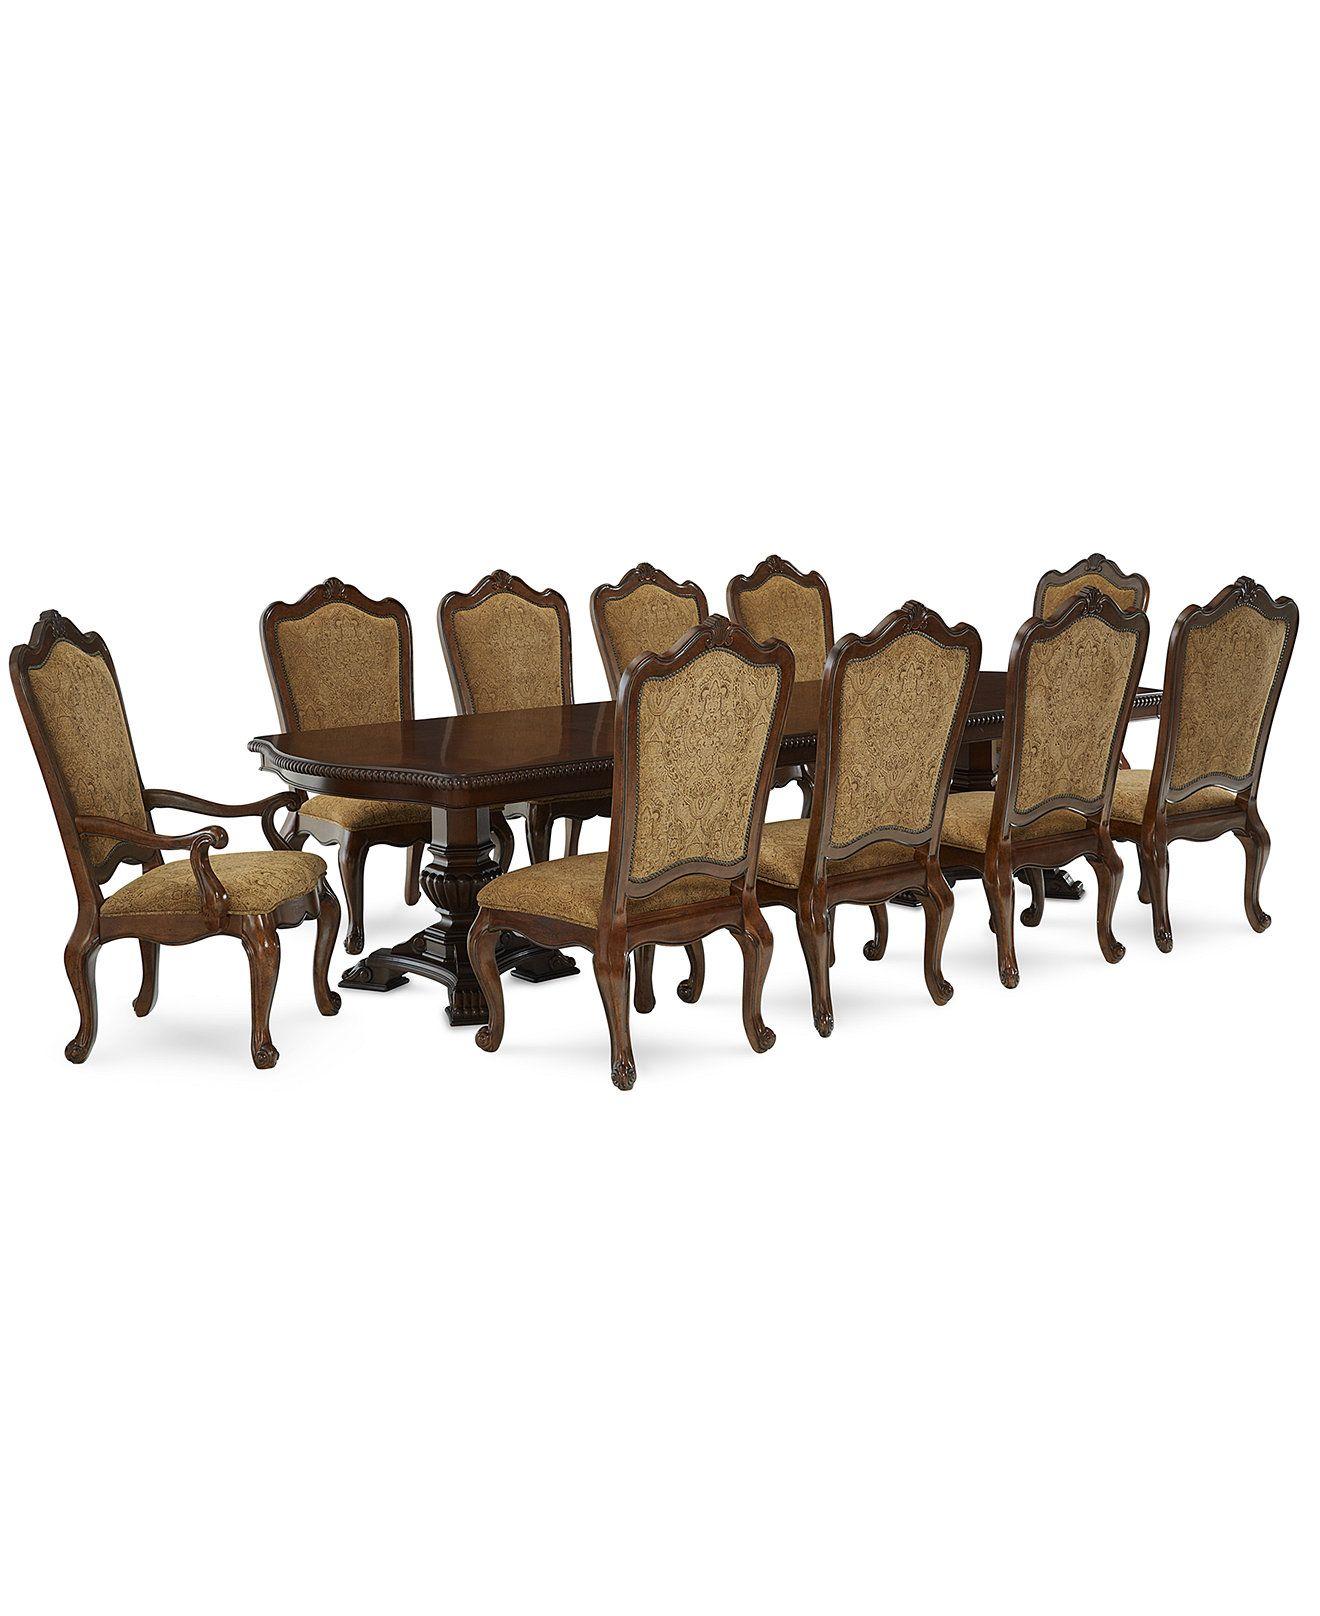 Merlot 11 Piece Formal Dining Room Furniture Set Table 8: Lakewood 11-Piece Dining Room Furniture Set (Double